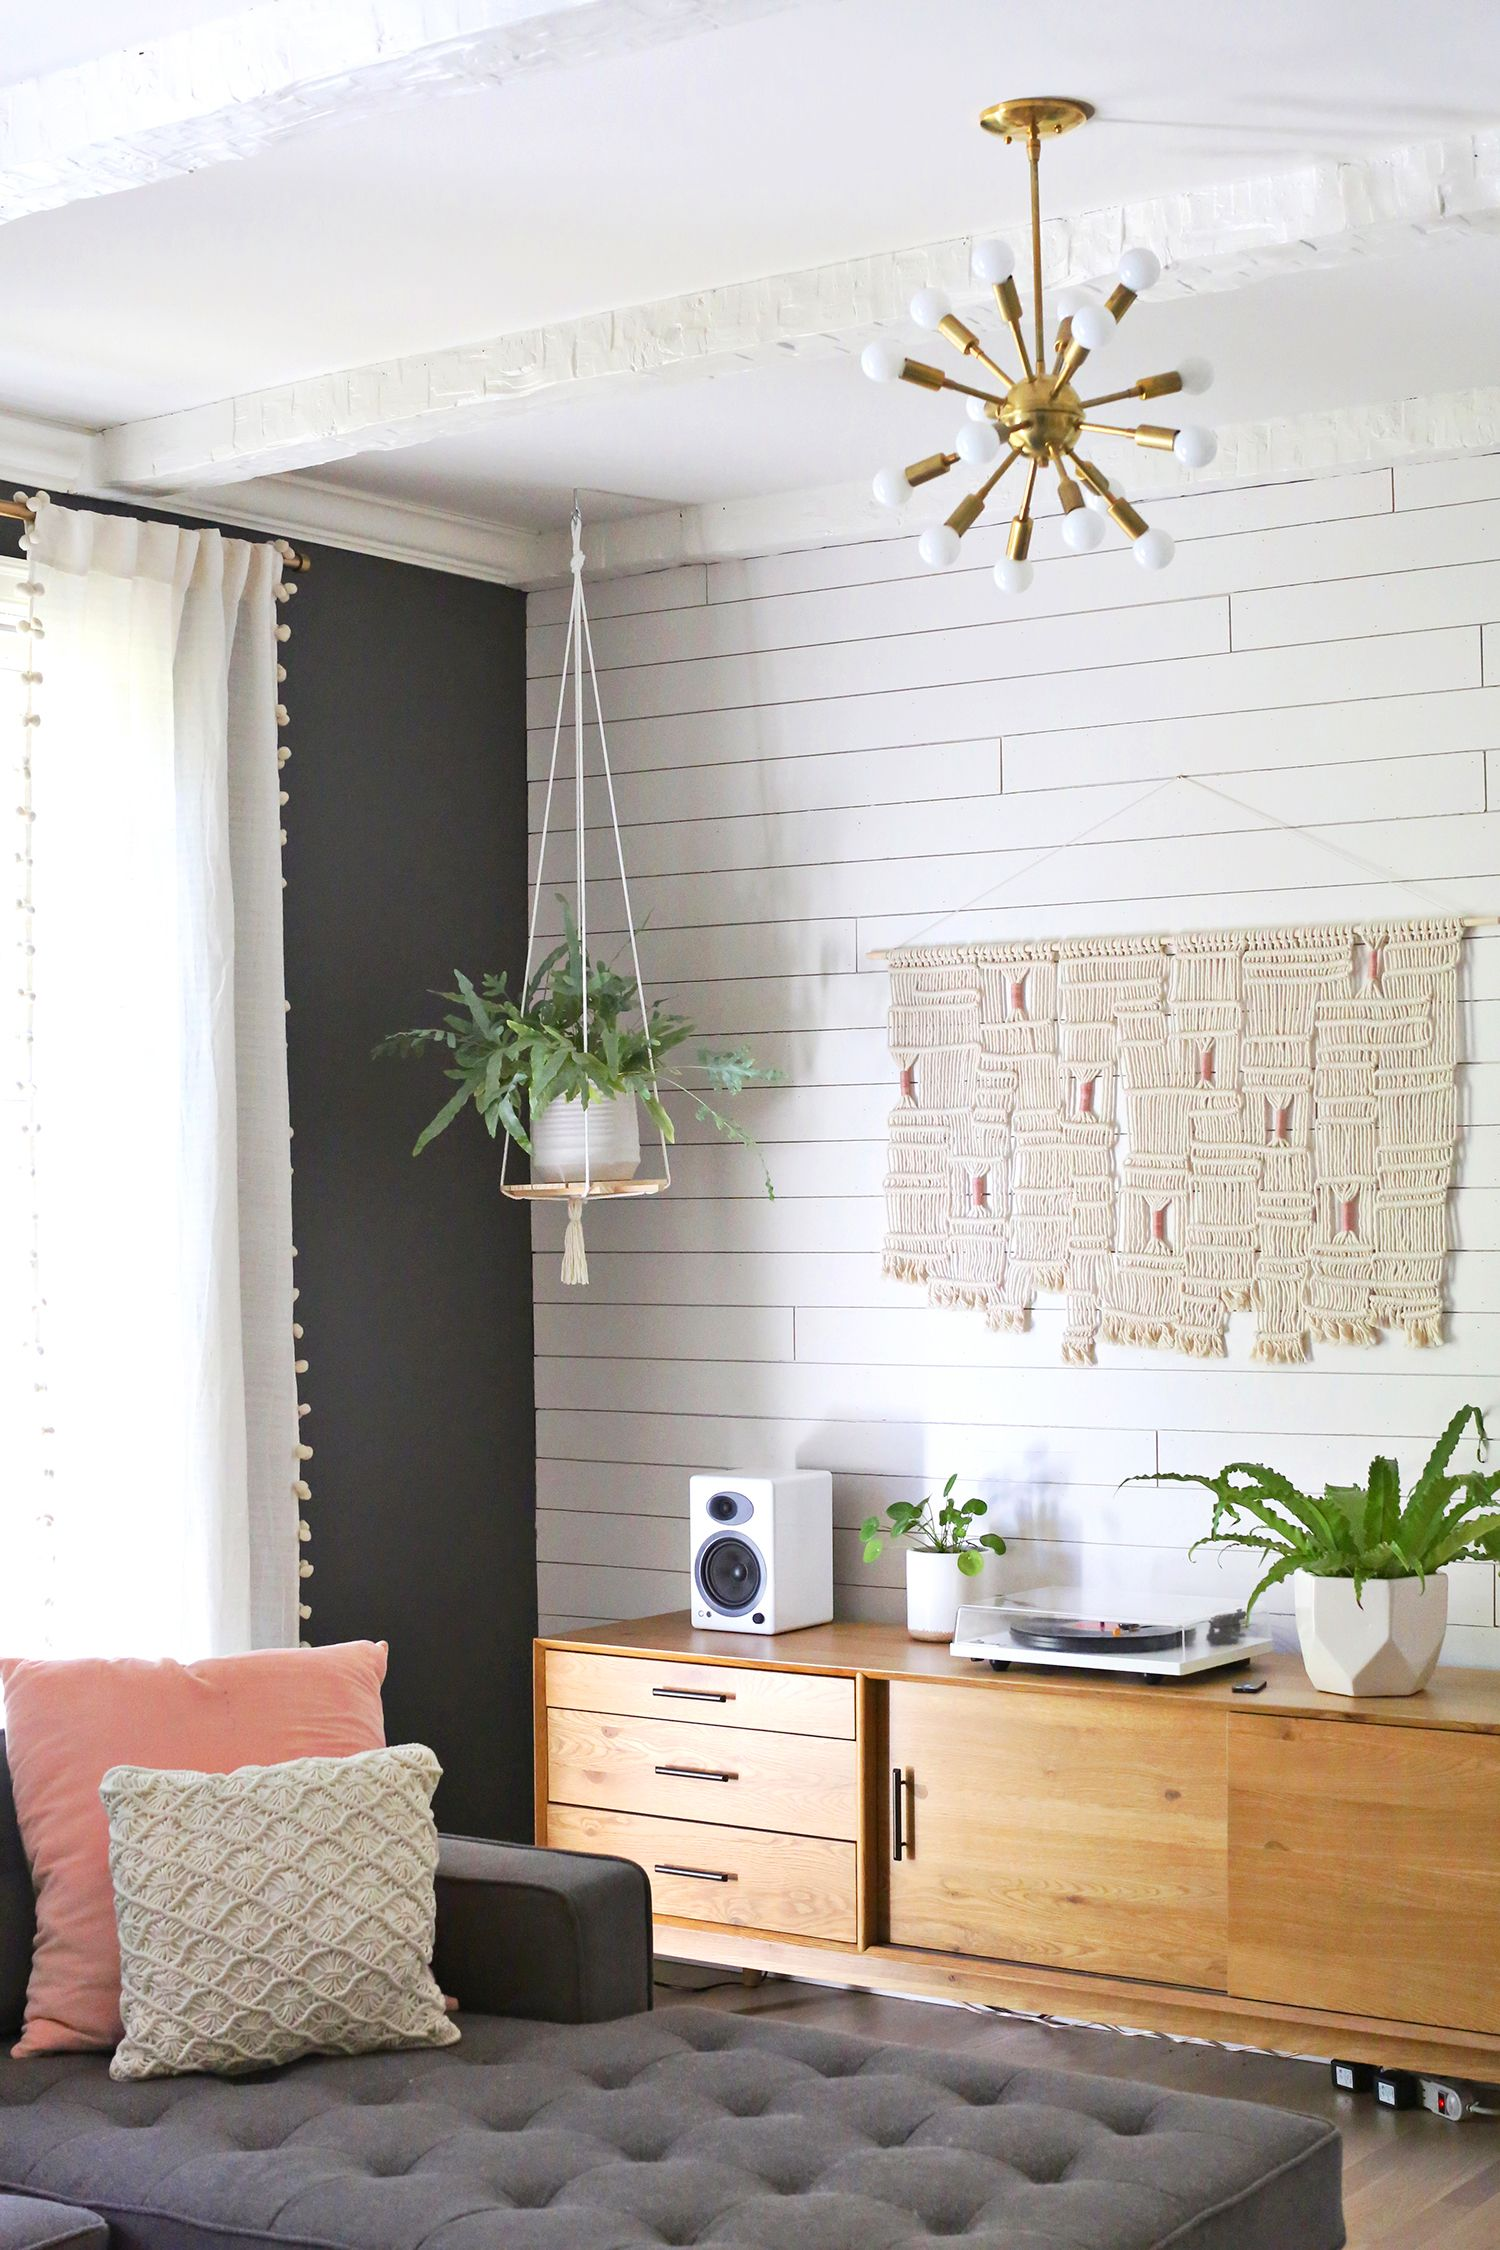 Hanging Plant Shelf DIY (A Beautiful Mess) Diy hanging